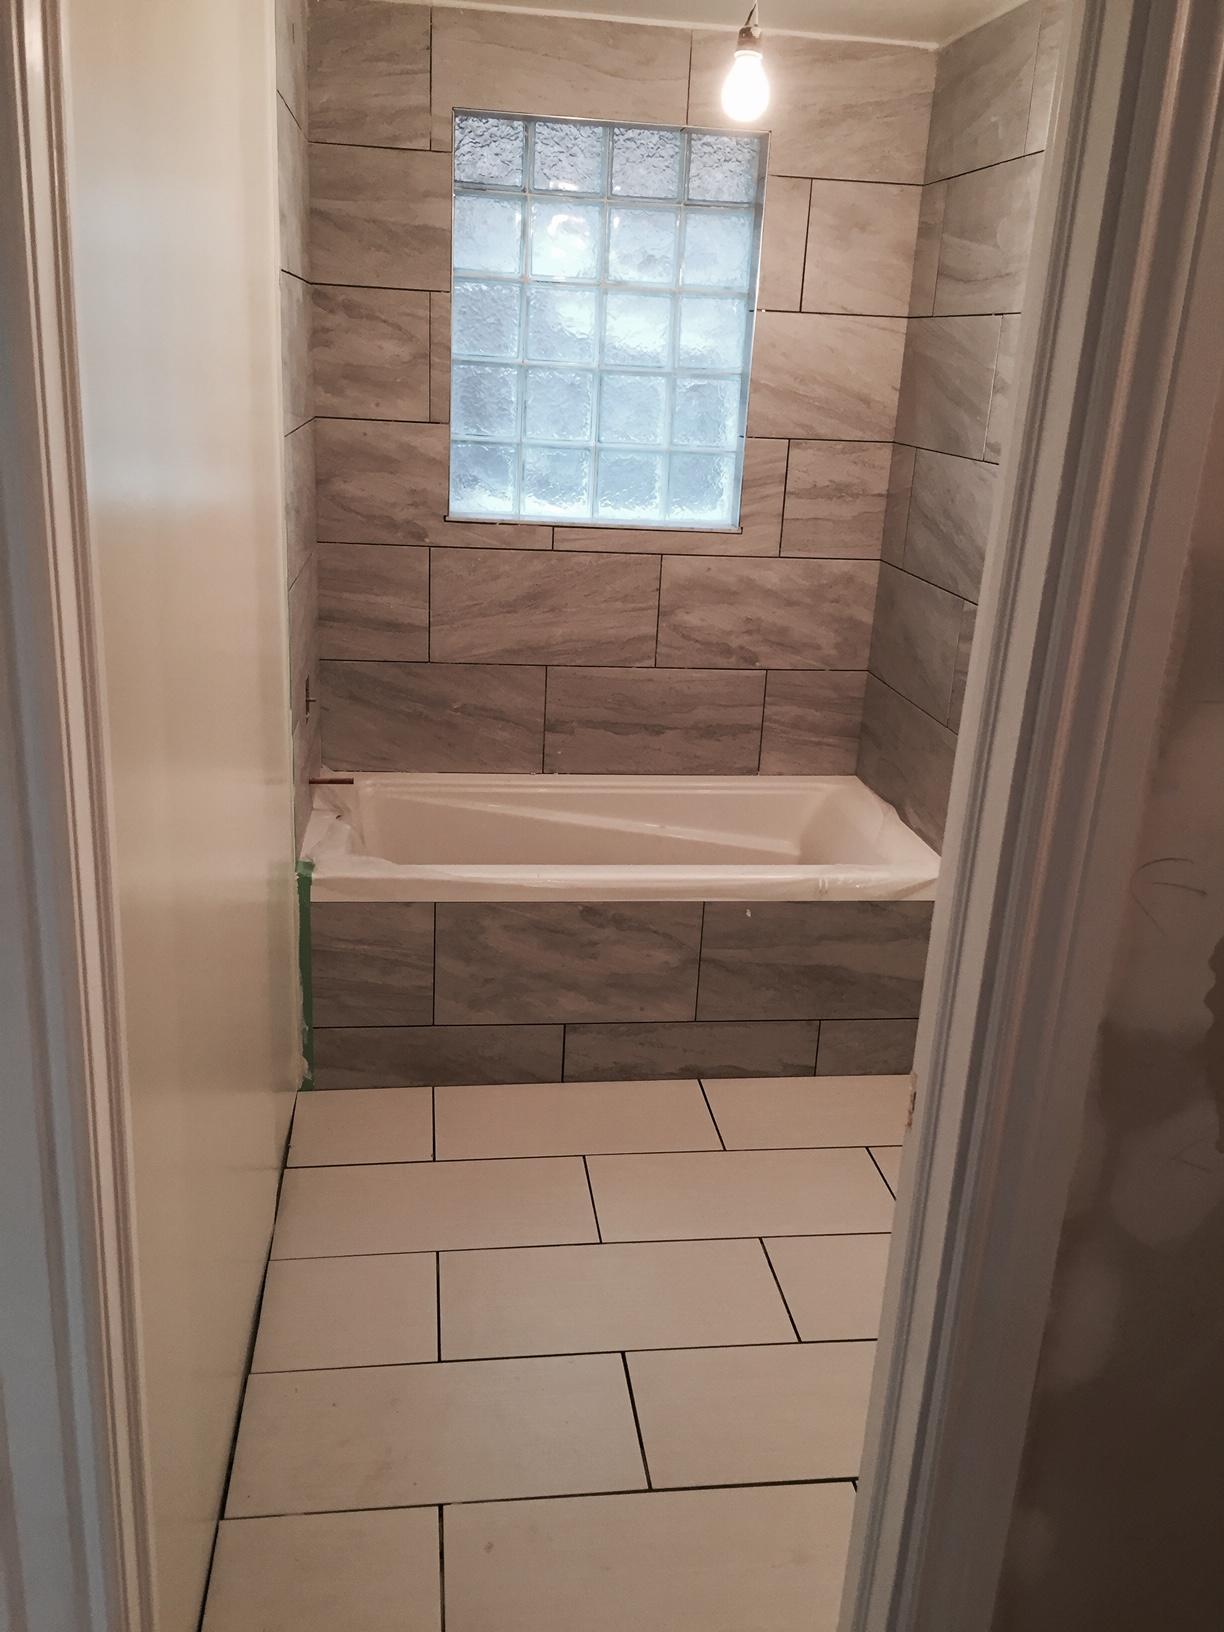 after-plumbing-bathtub-toronto-installation